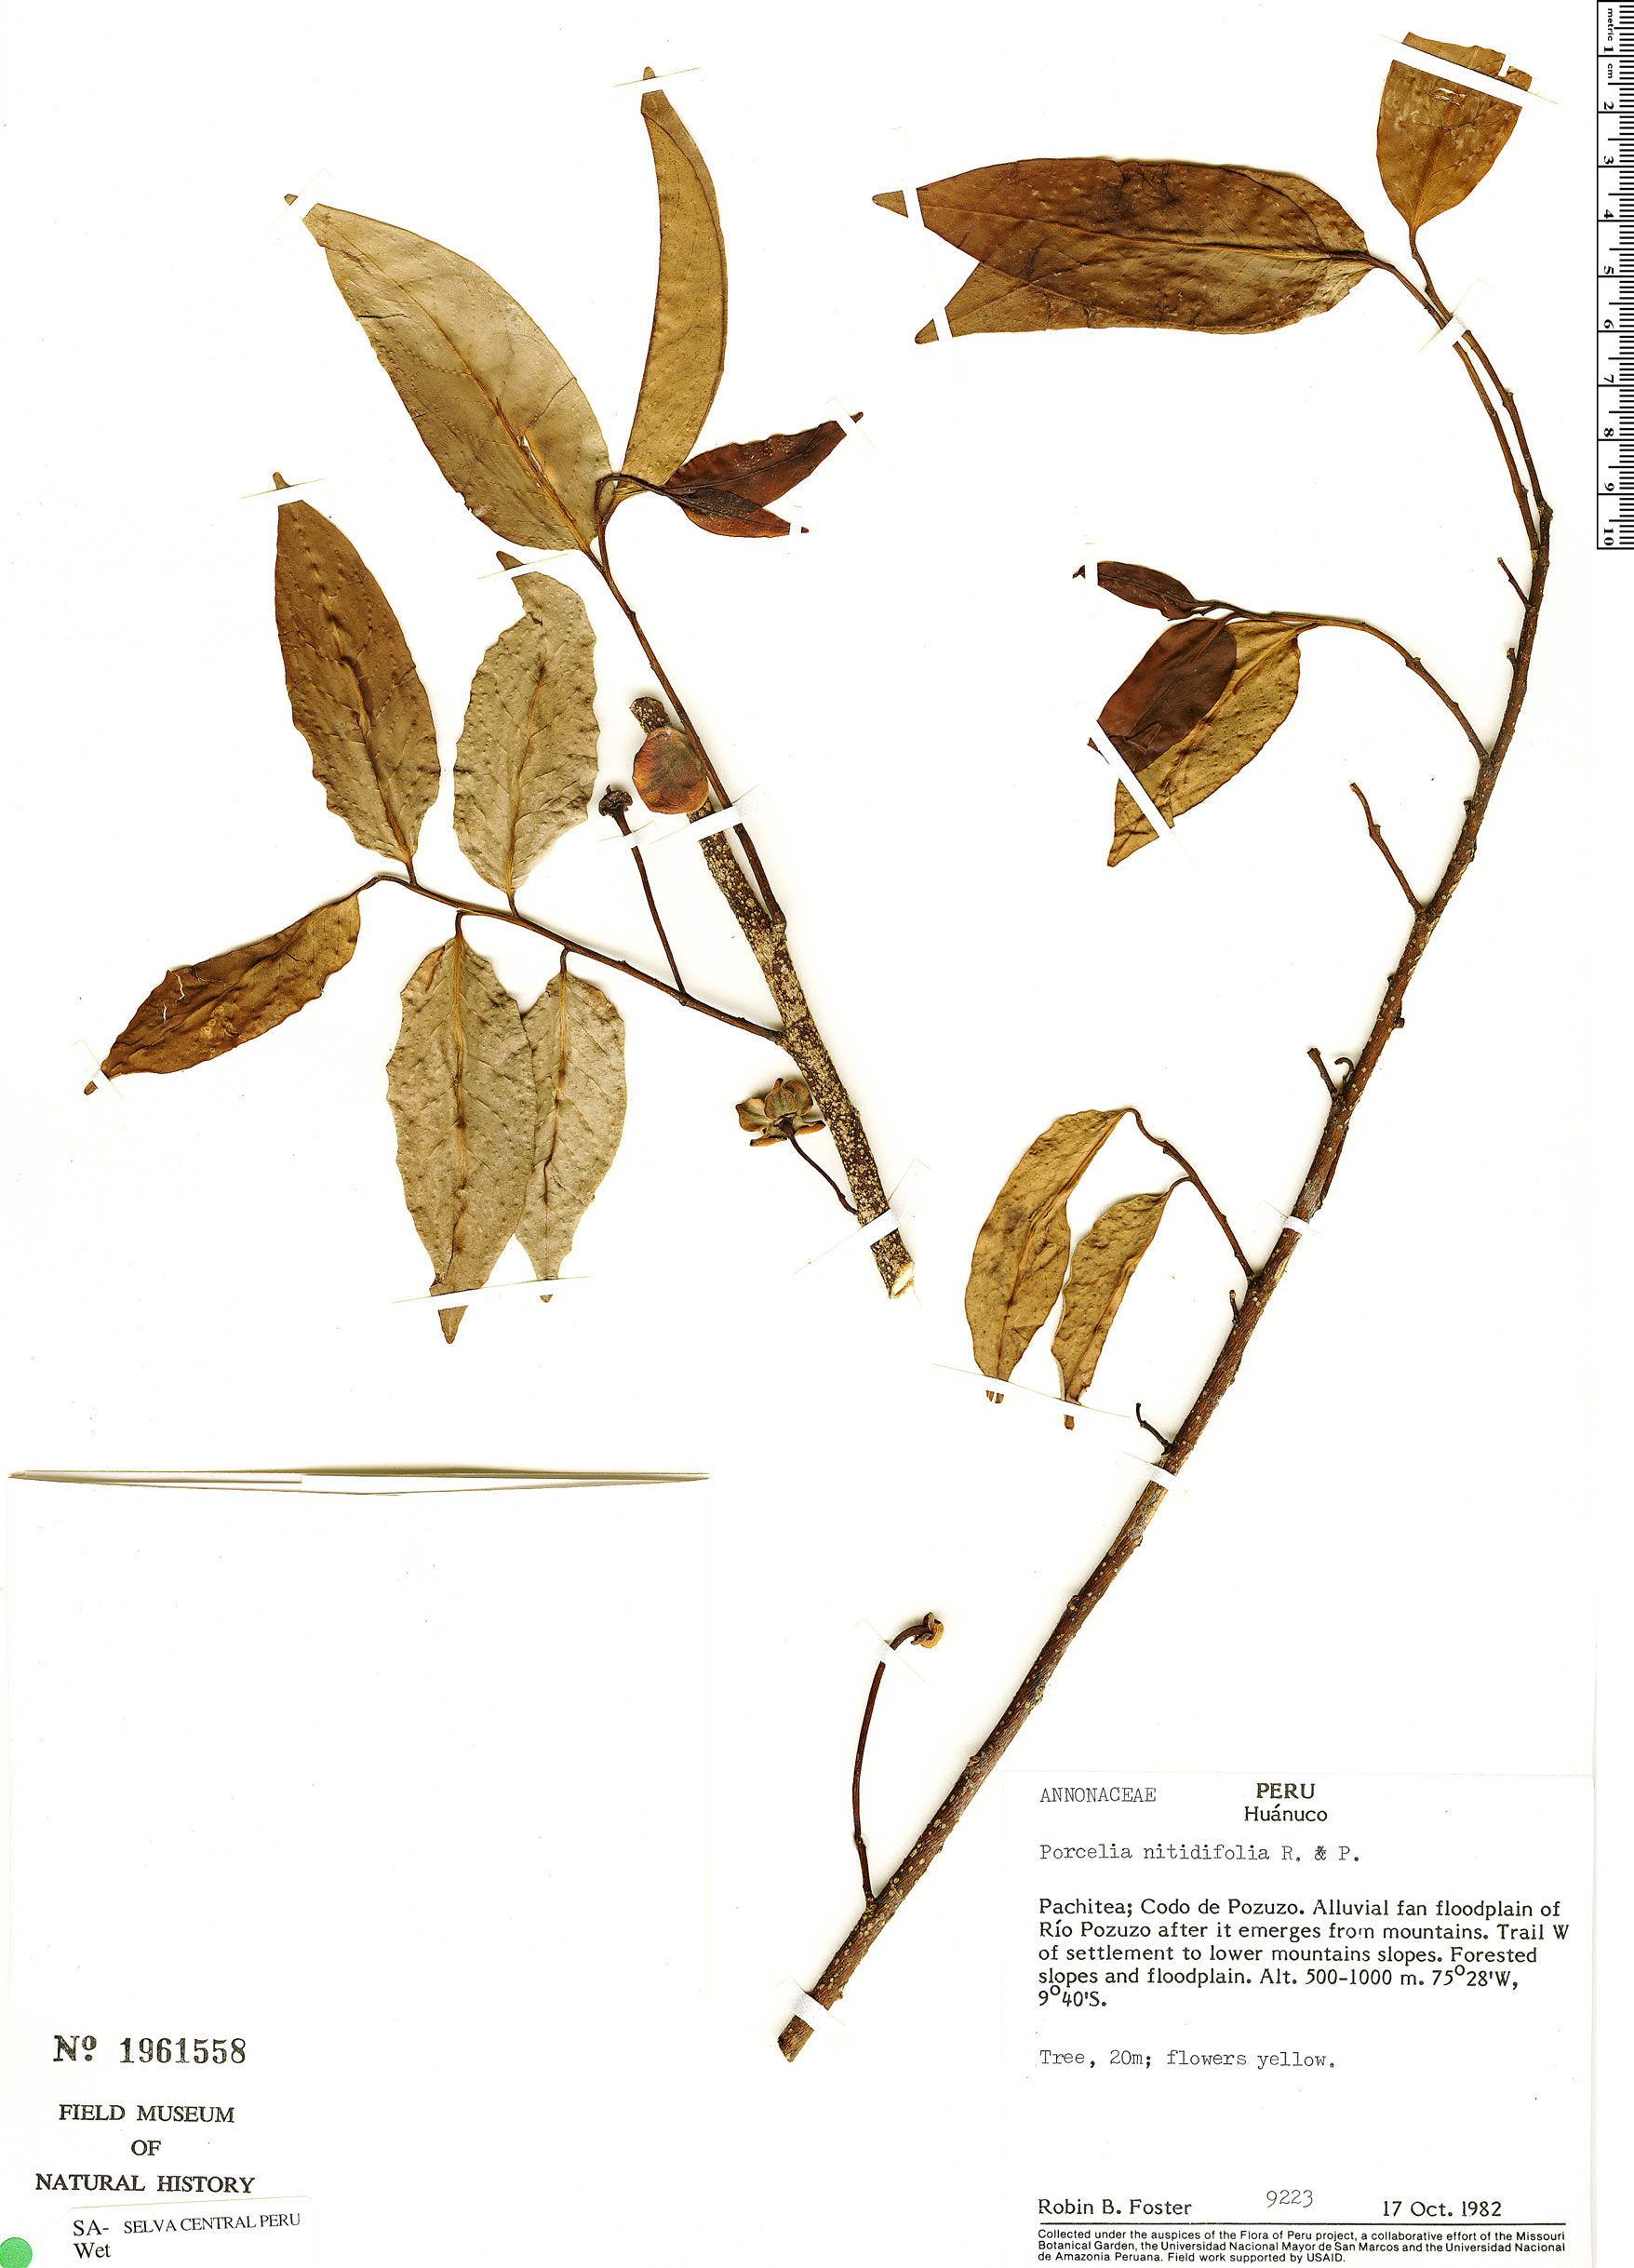 Espécimen: Porcelia ponderosa